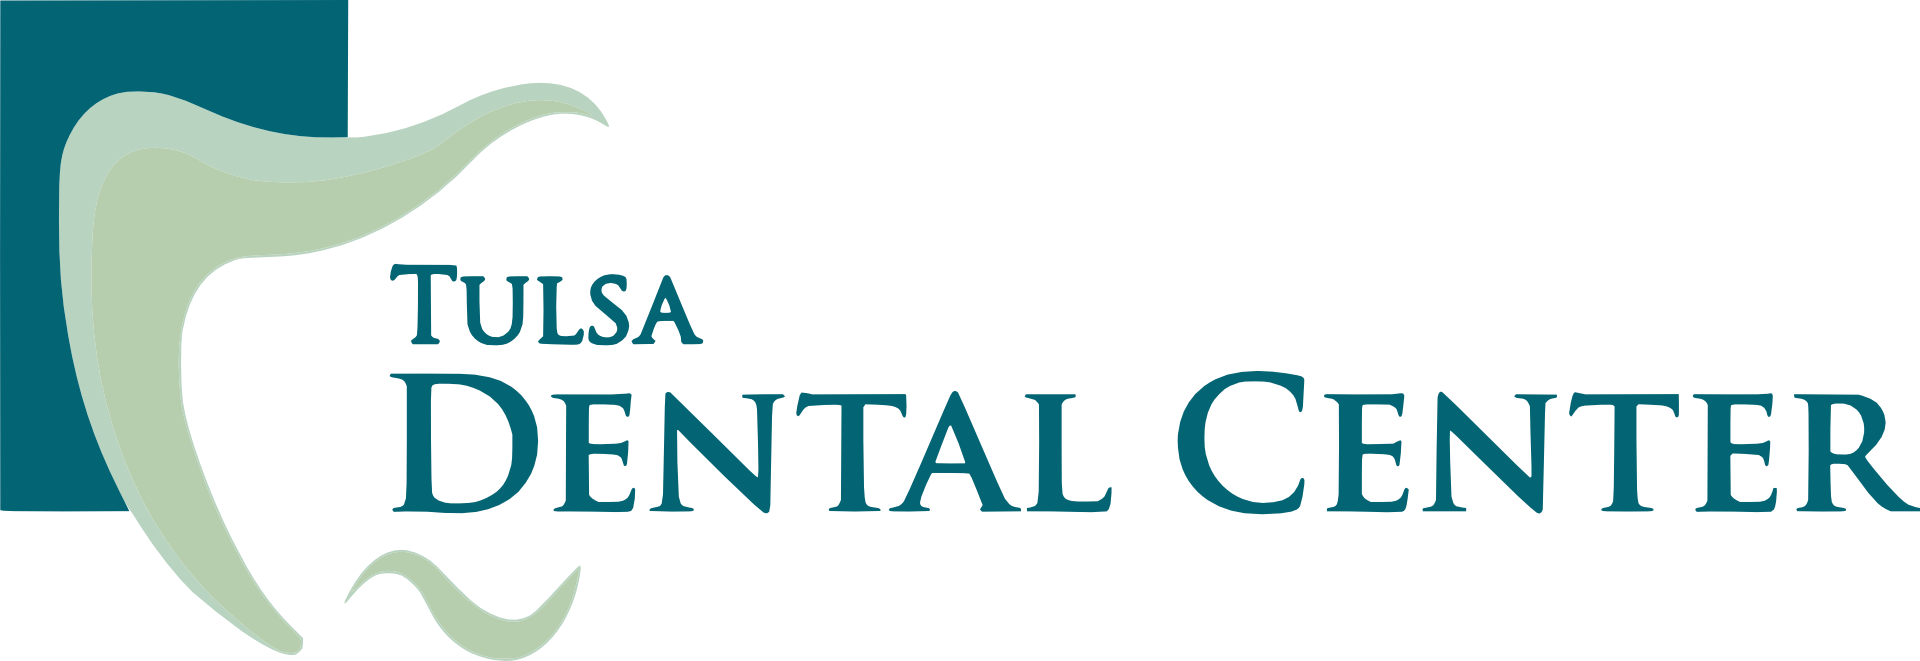 Tulsa Dental Center reviews | Dental at 4824 S. Union Ave - Tulsa